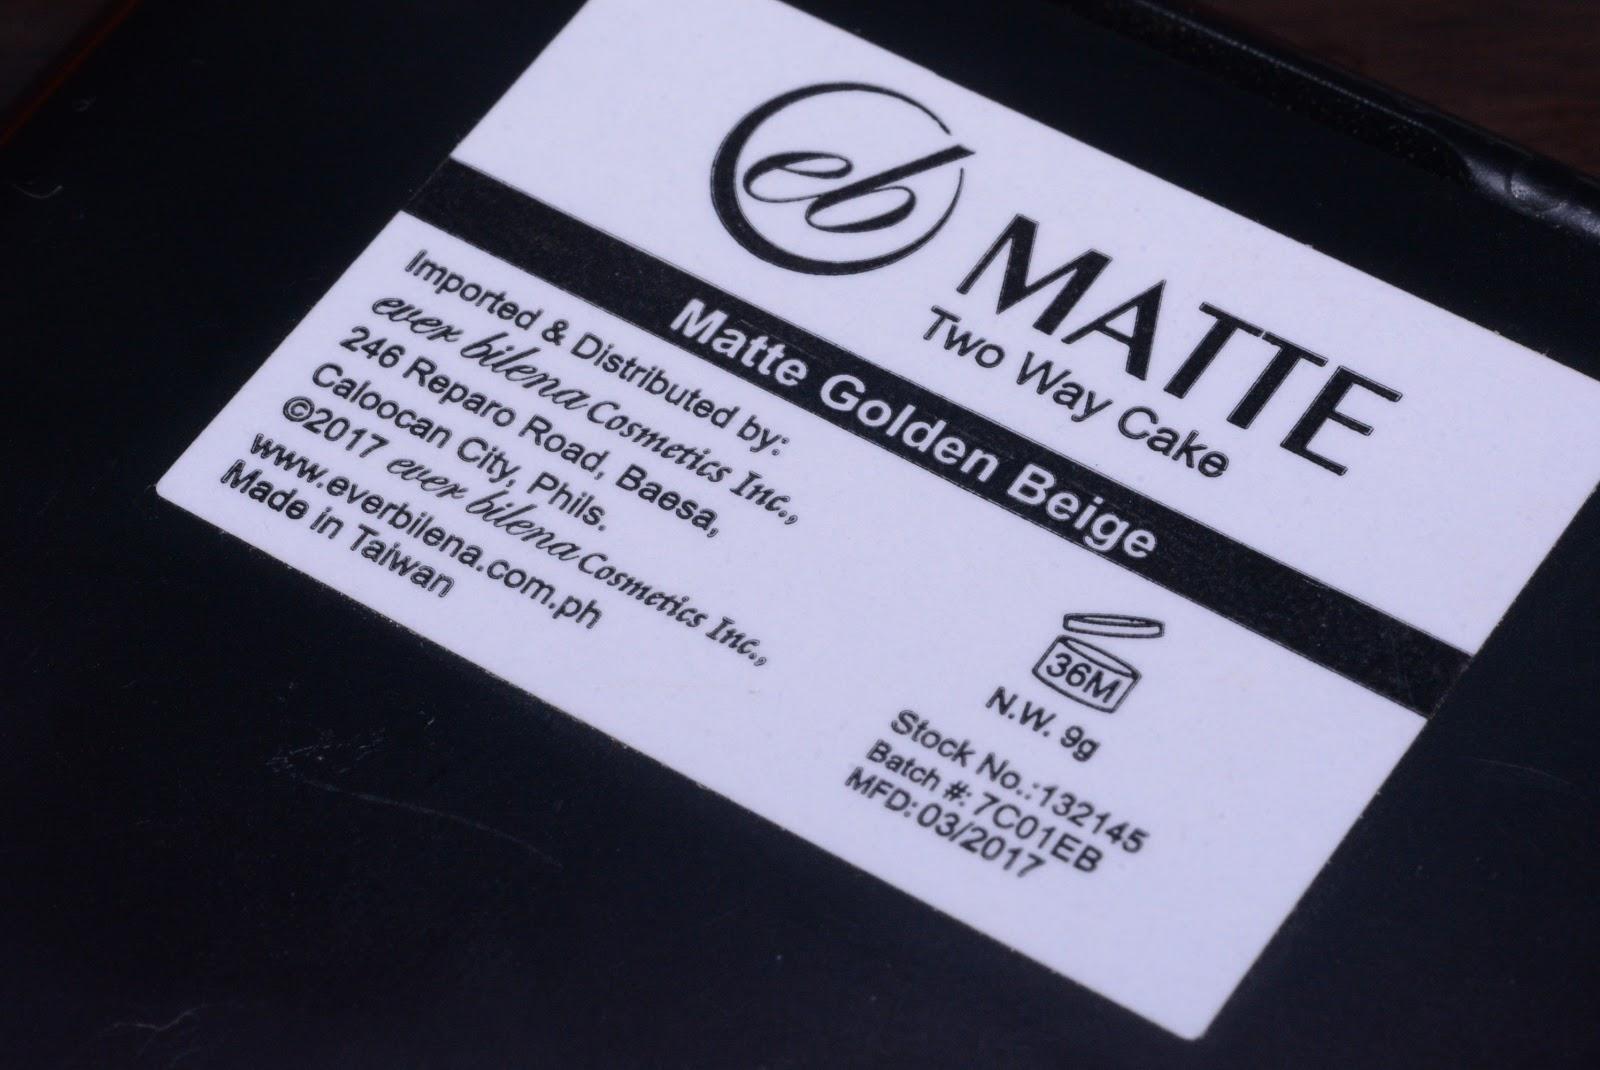 REVIEW: Ever Bilena Matte Two Way Cake in Golden Beige